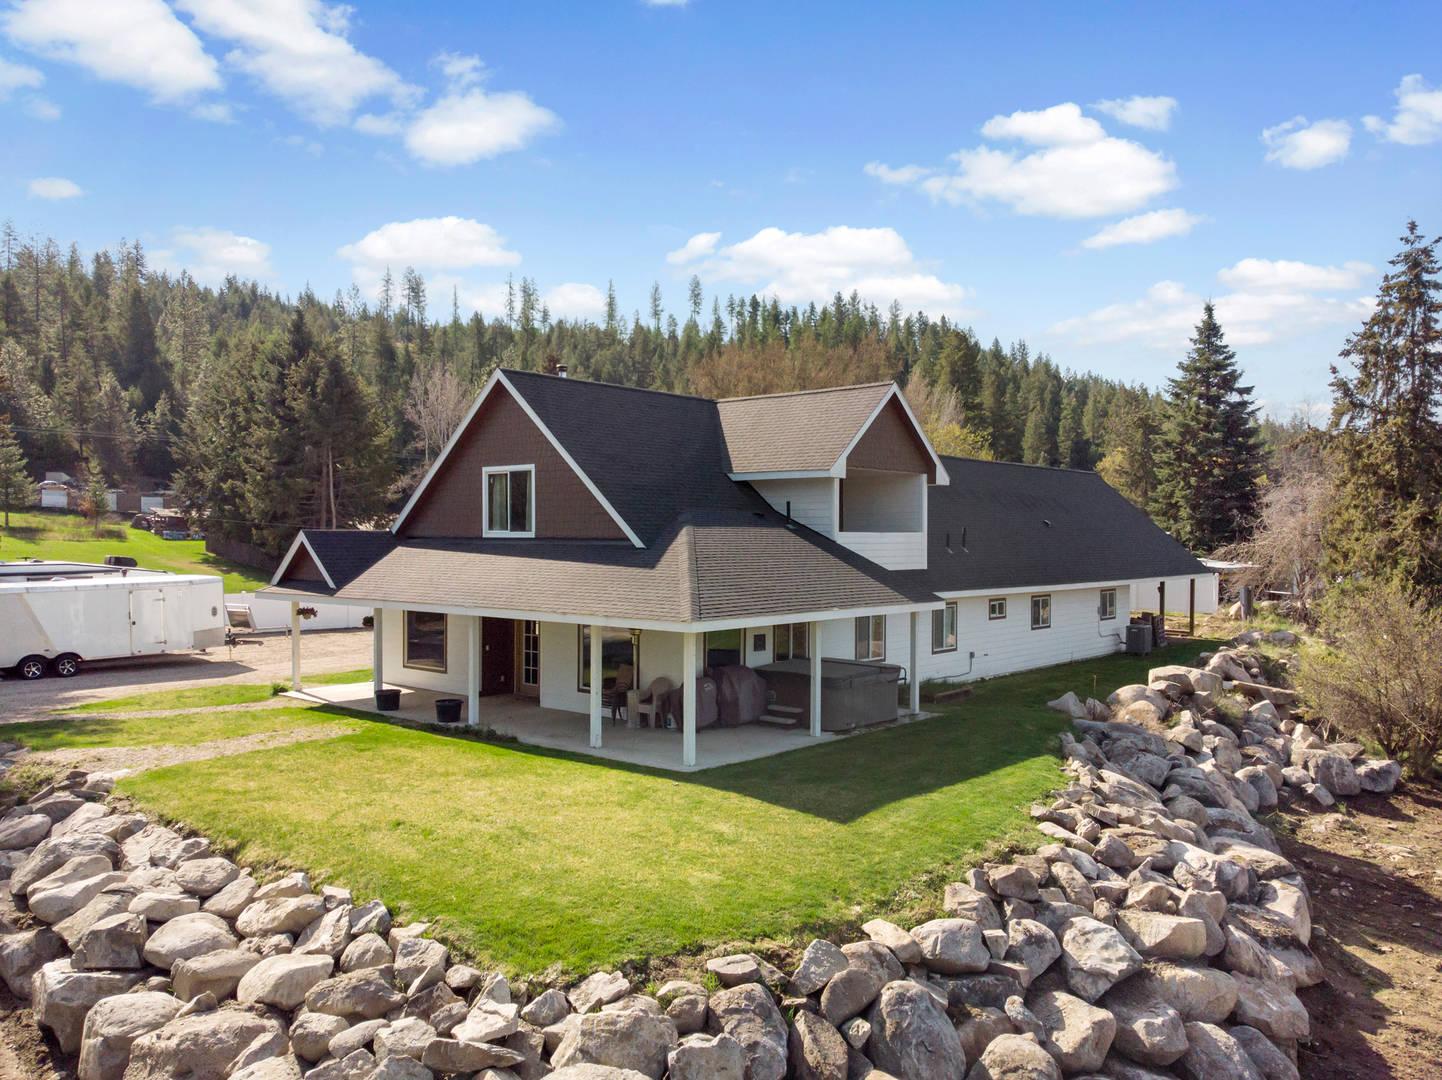 39605 N Elk Chattaroy Rd. Elk, WA 99009